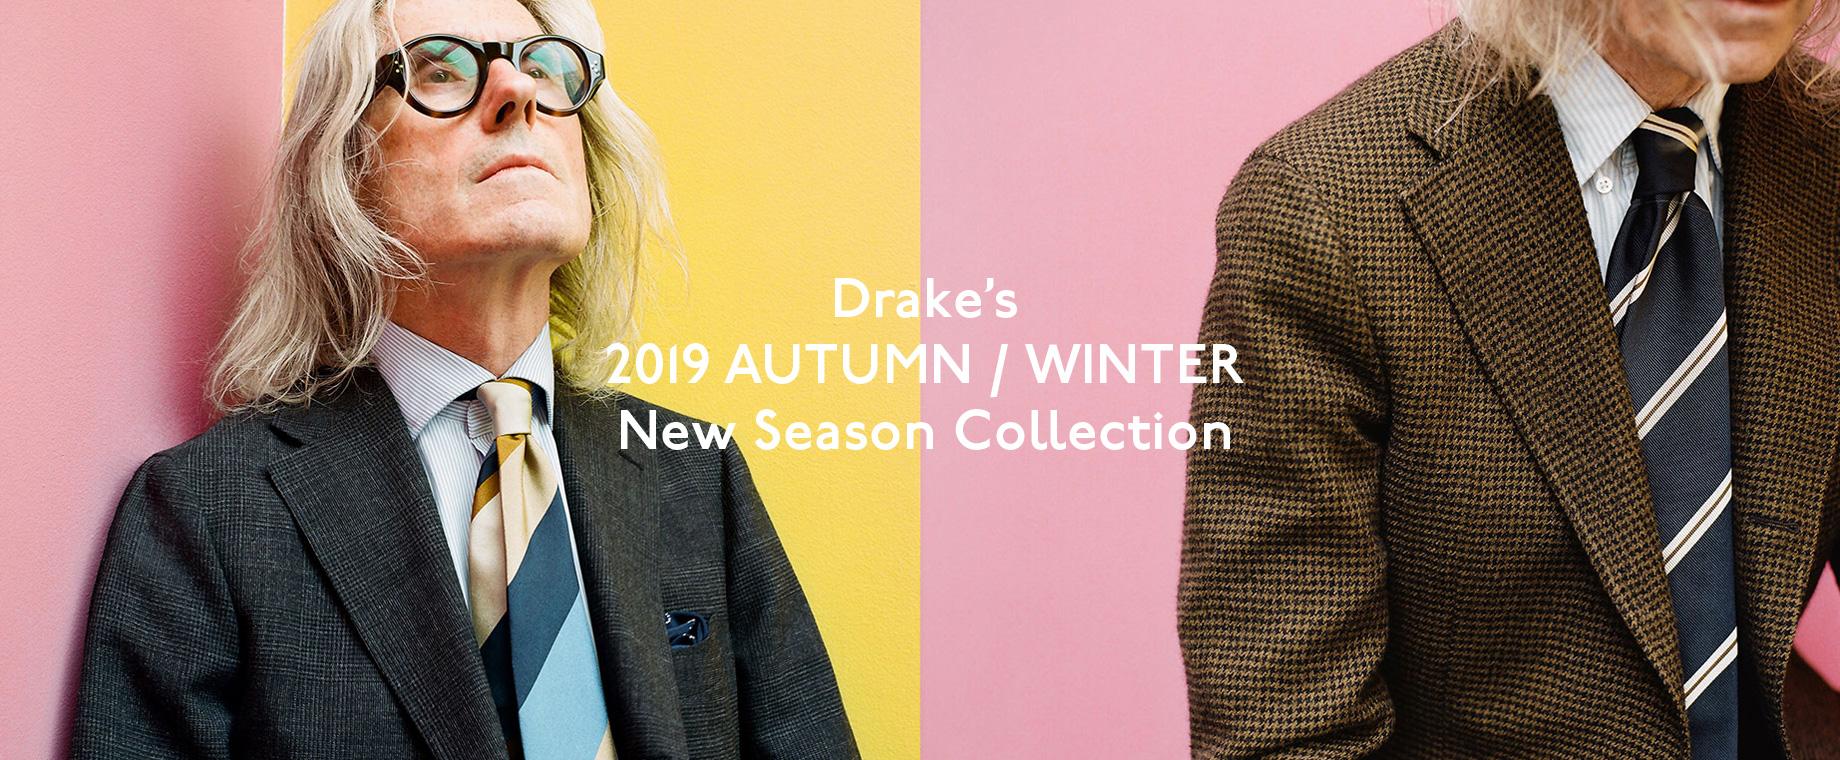 Drake's 2019年秋冬最新アイテムが入荷!シーズンの世界観を演出する最新ルックブックを公開